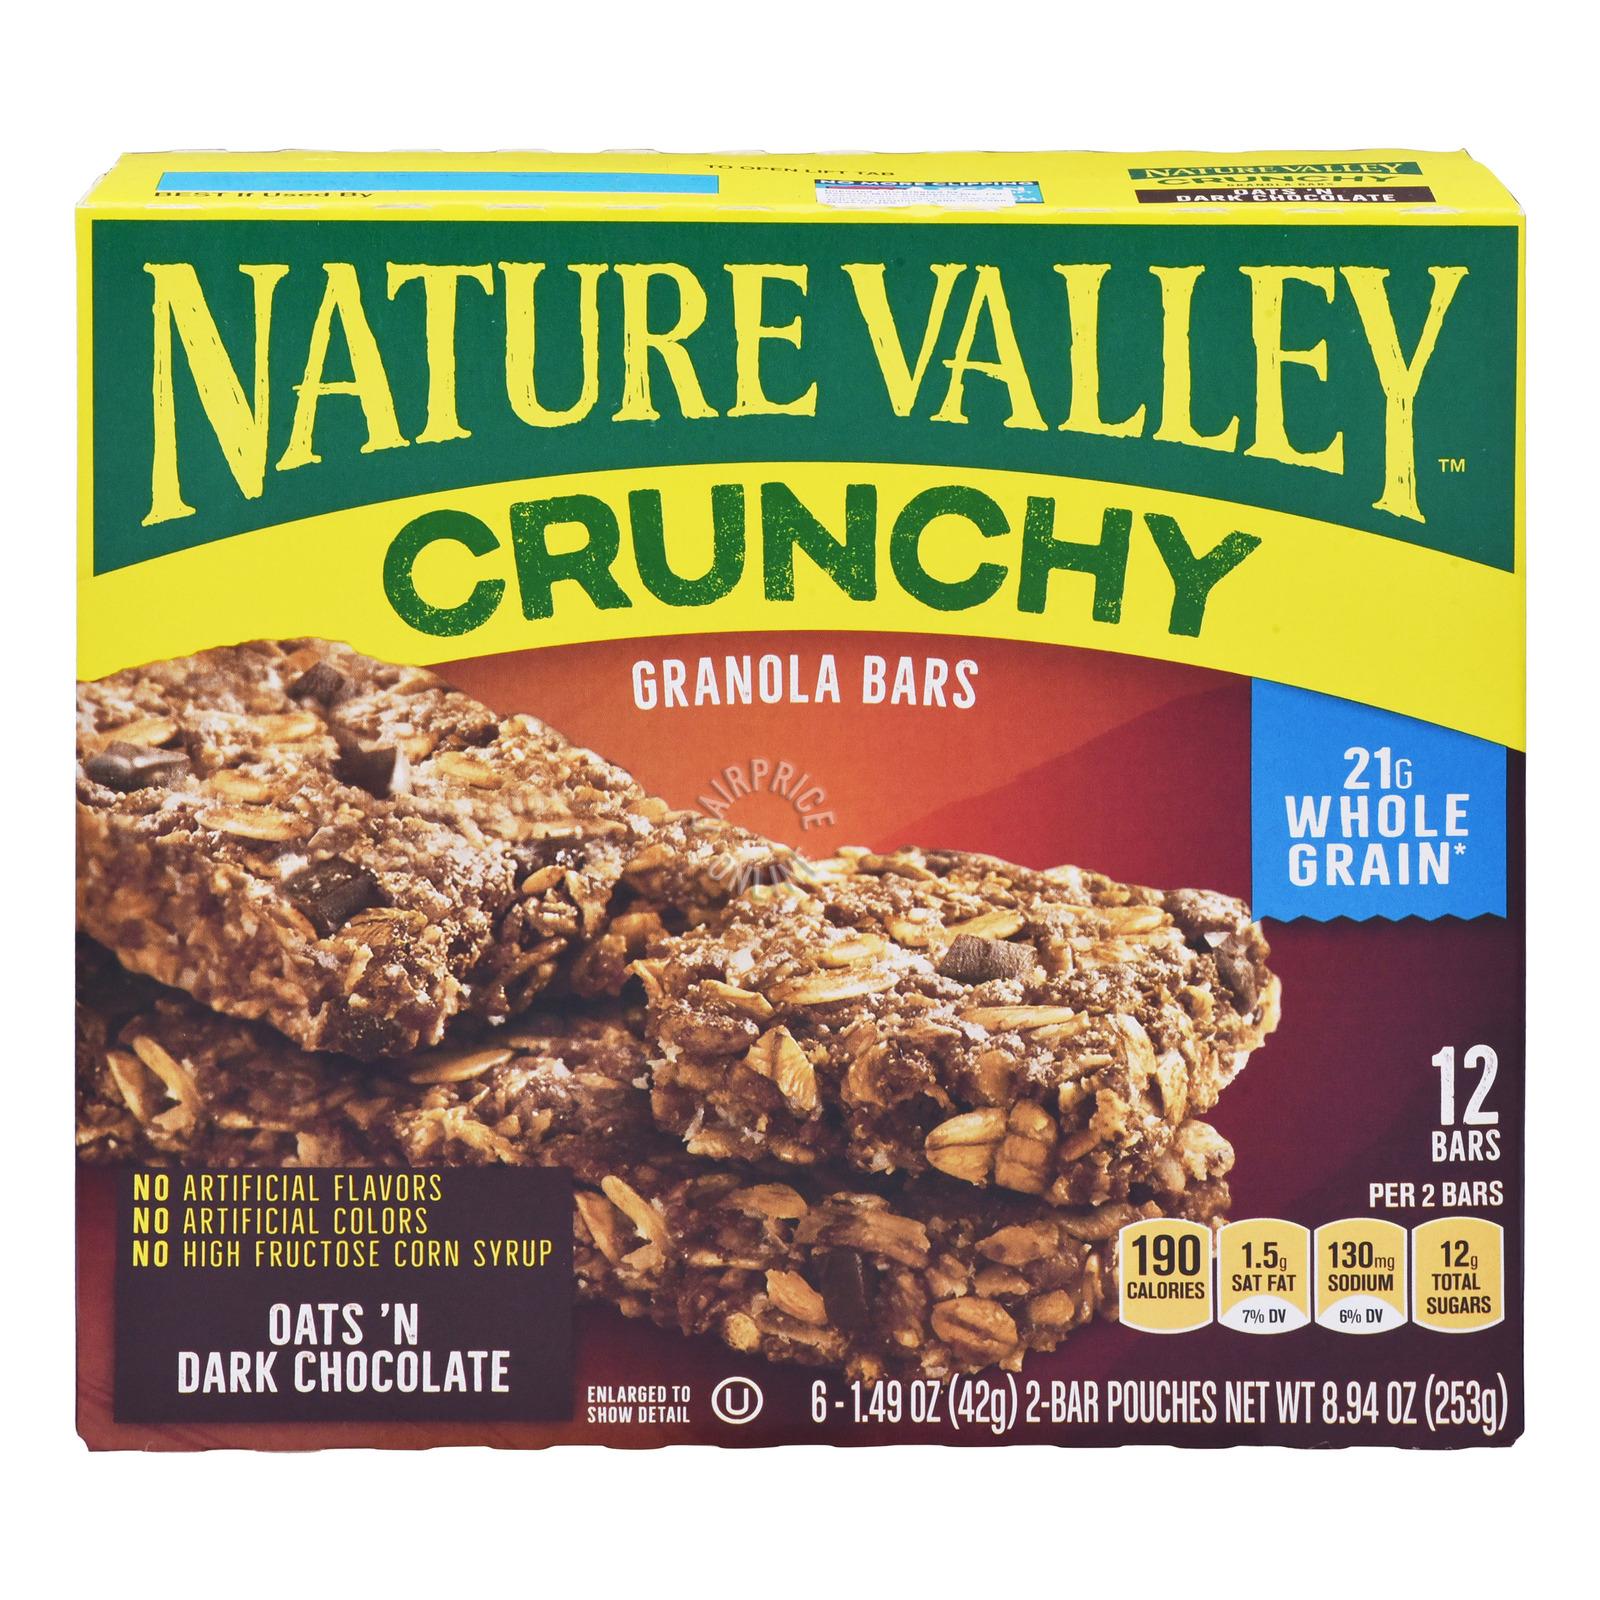 Nature Valley Crunchy Granola Bar - Oats 'n Dark Chocolate